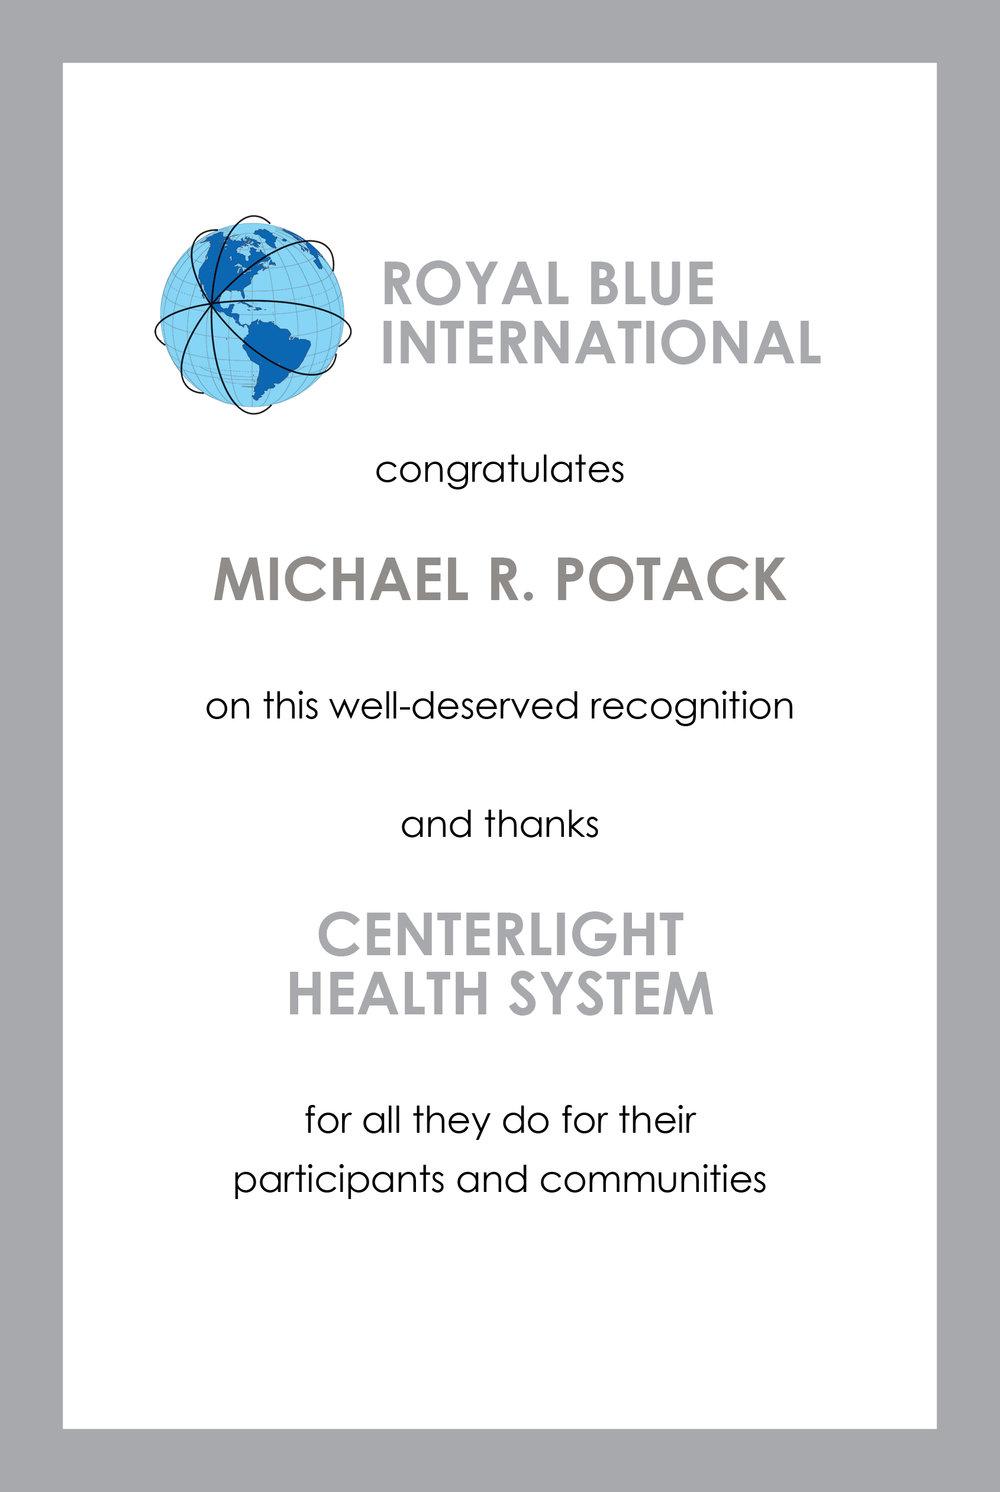 Silver ad - Royal Blue.jpg